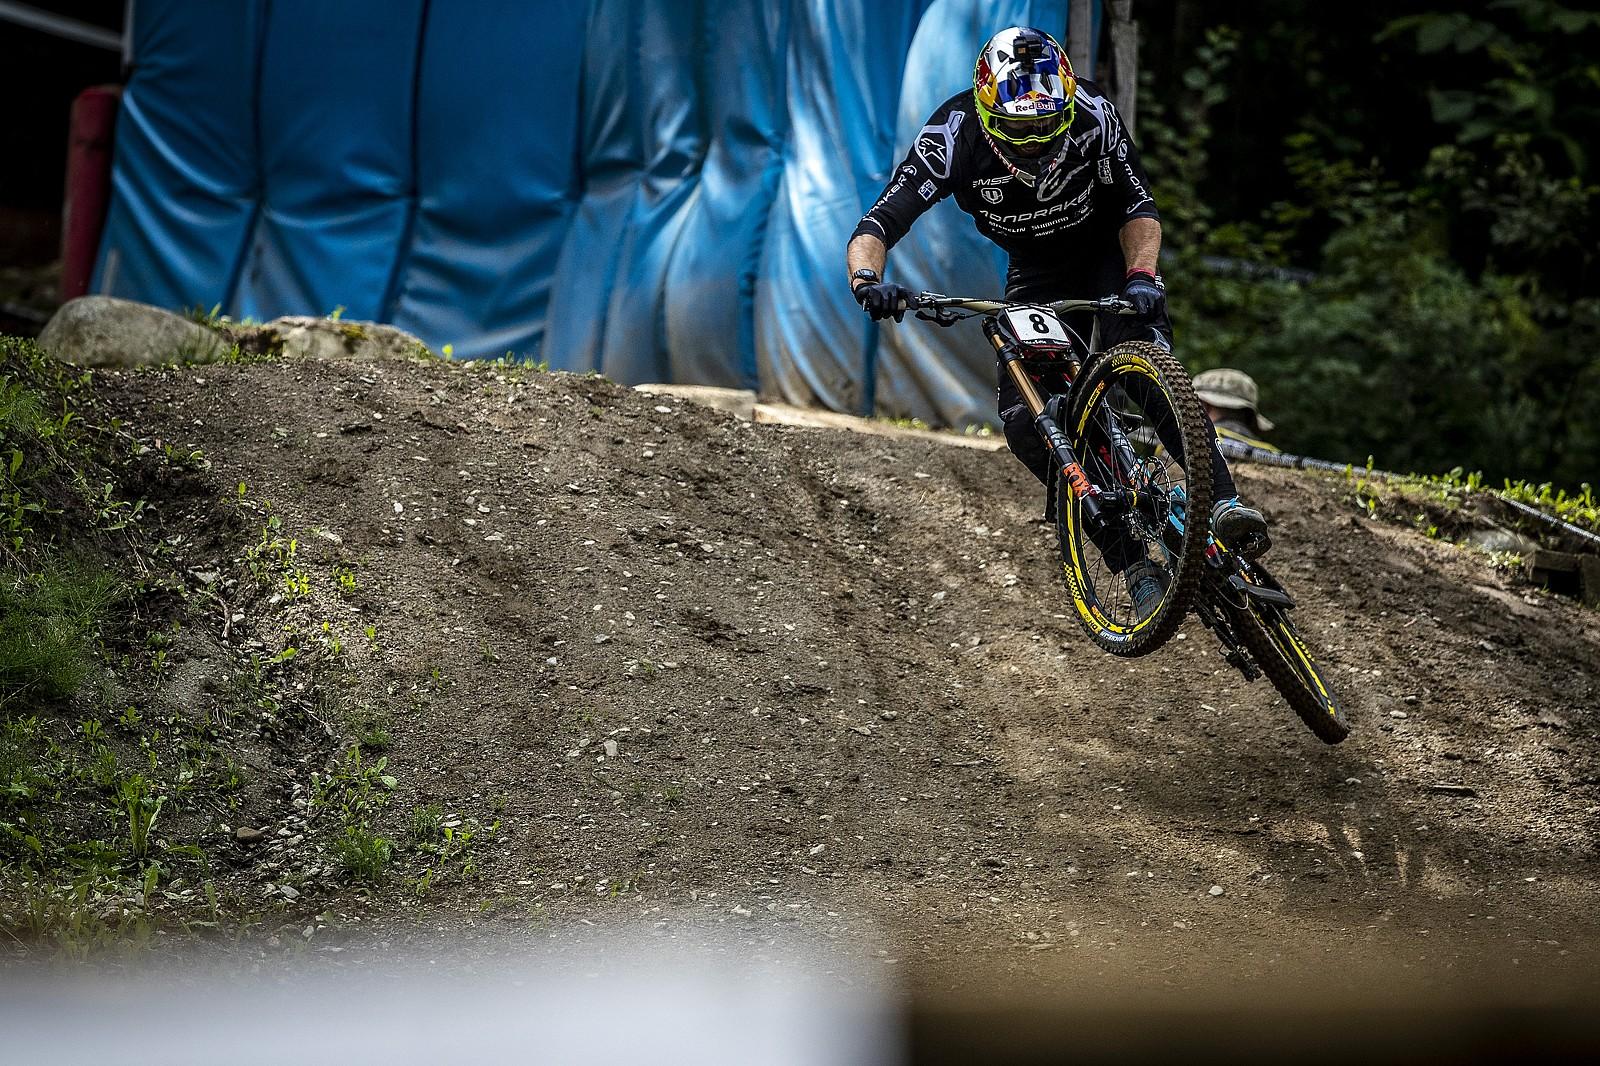 Val di Sole Moto Moves, Brook Macdonald - A Big Bad Batch of Brook Macdonald Bangers - Mountain Biking Pictures - Vital MTB